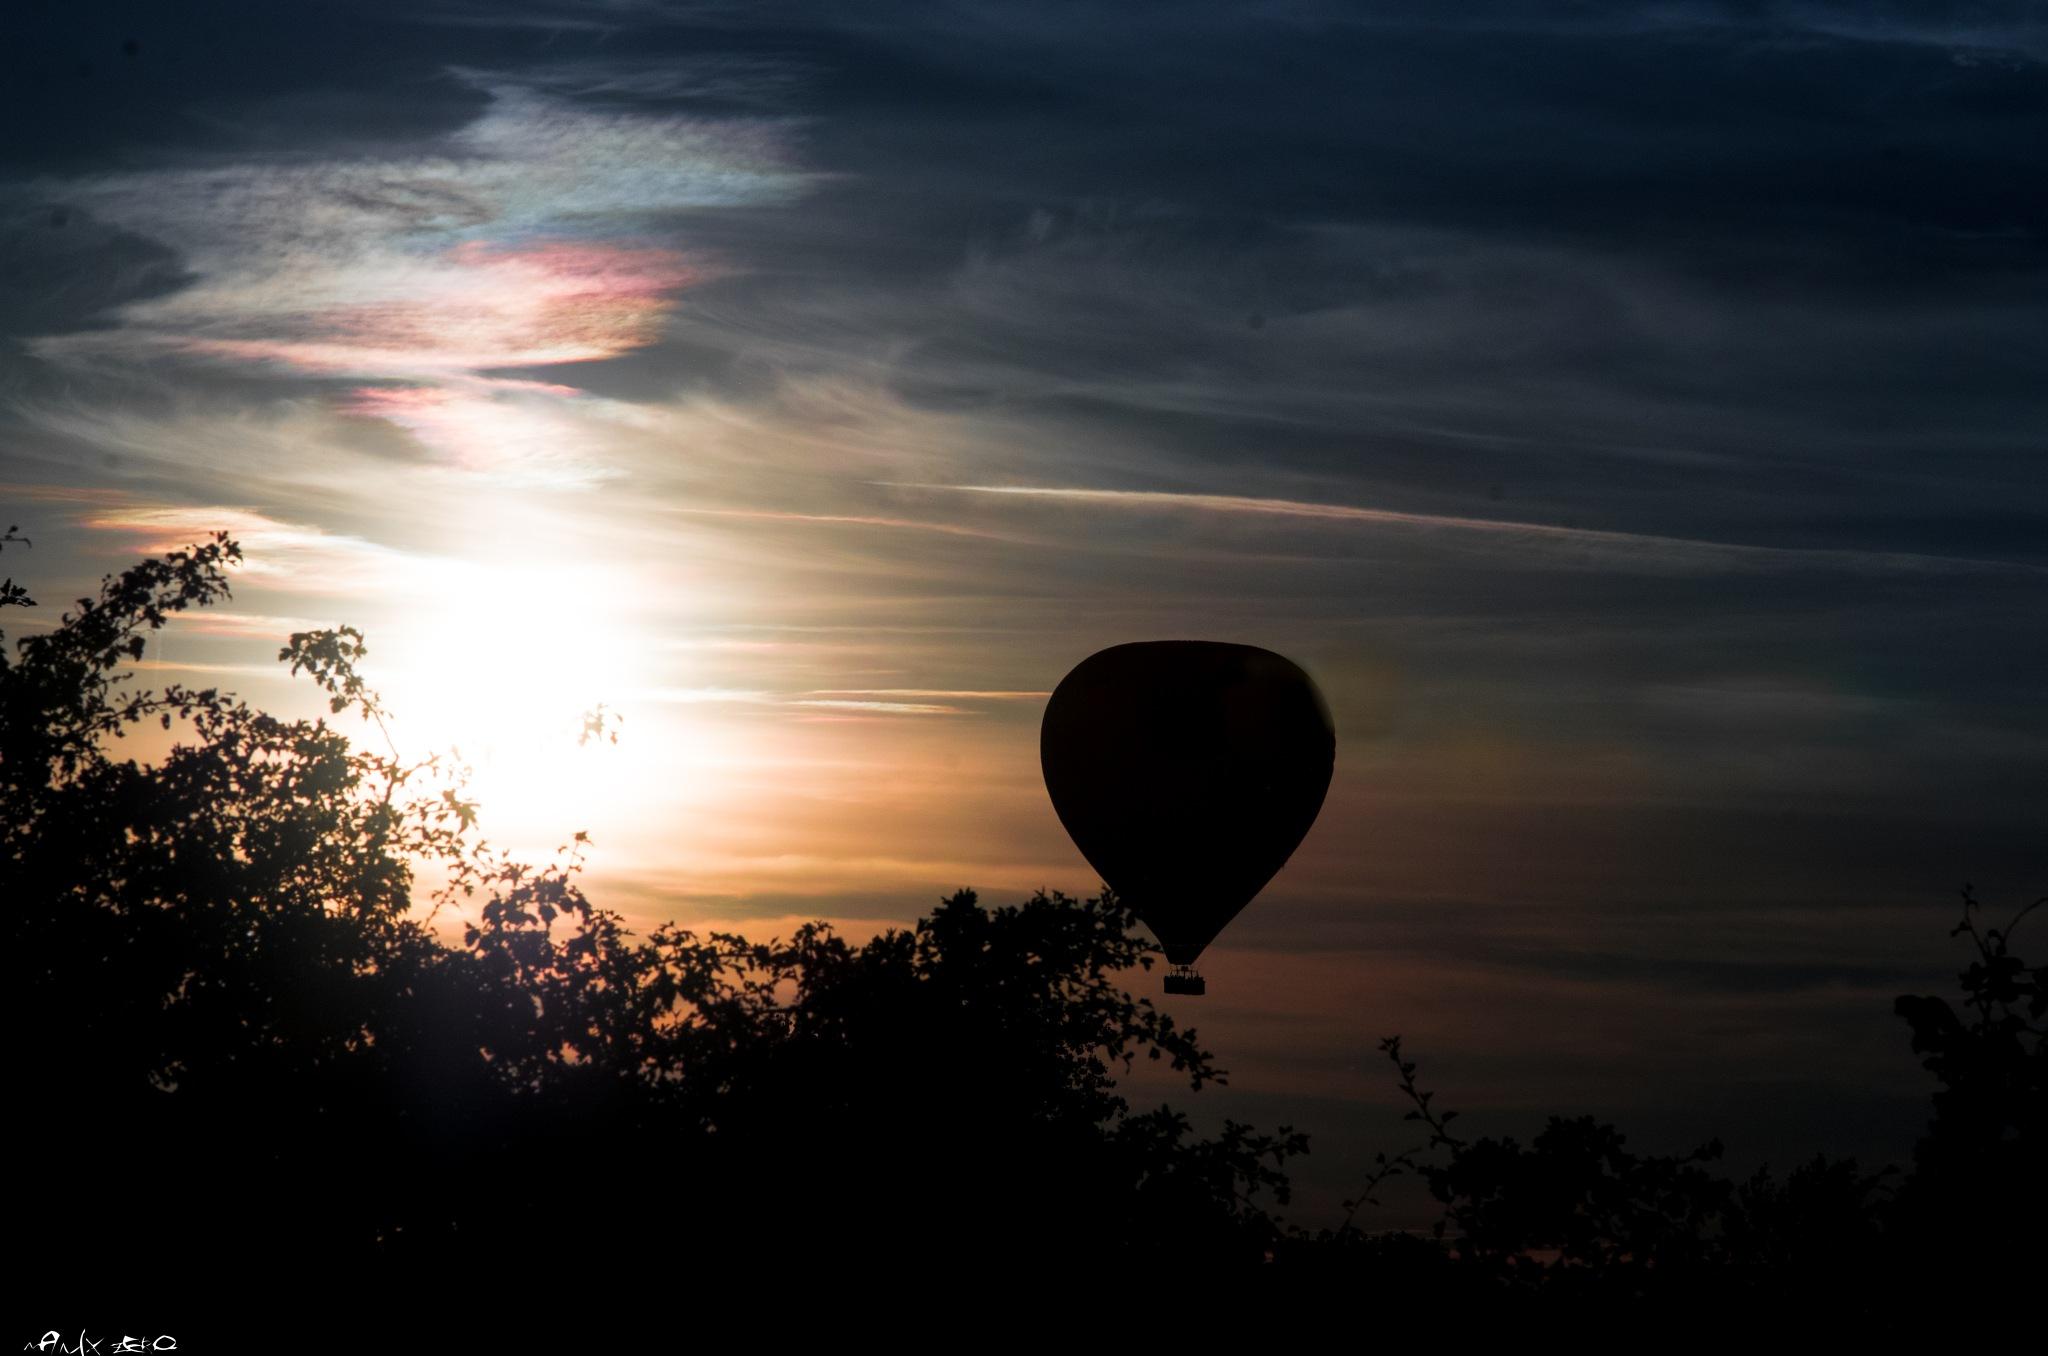 Hot Air Balloon 2 by ManixZero